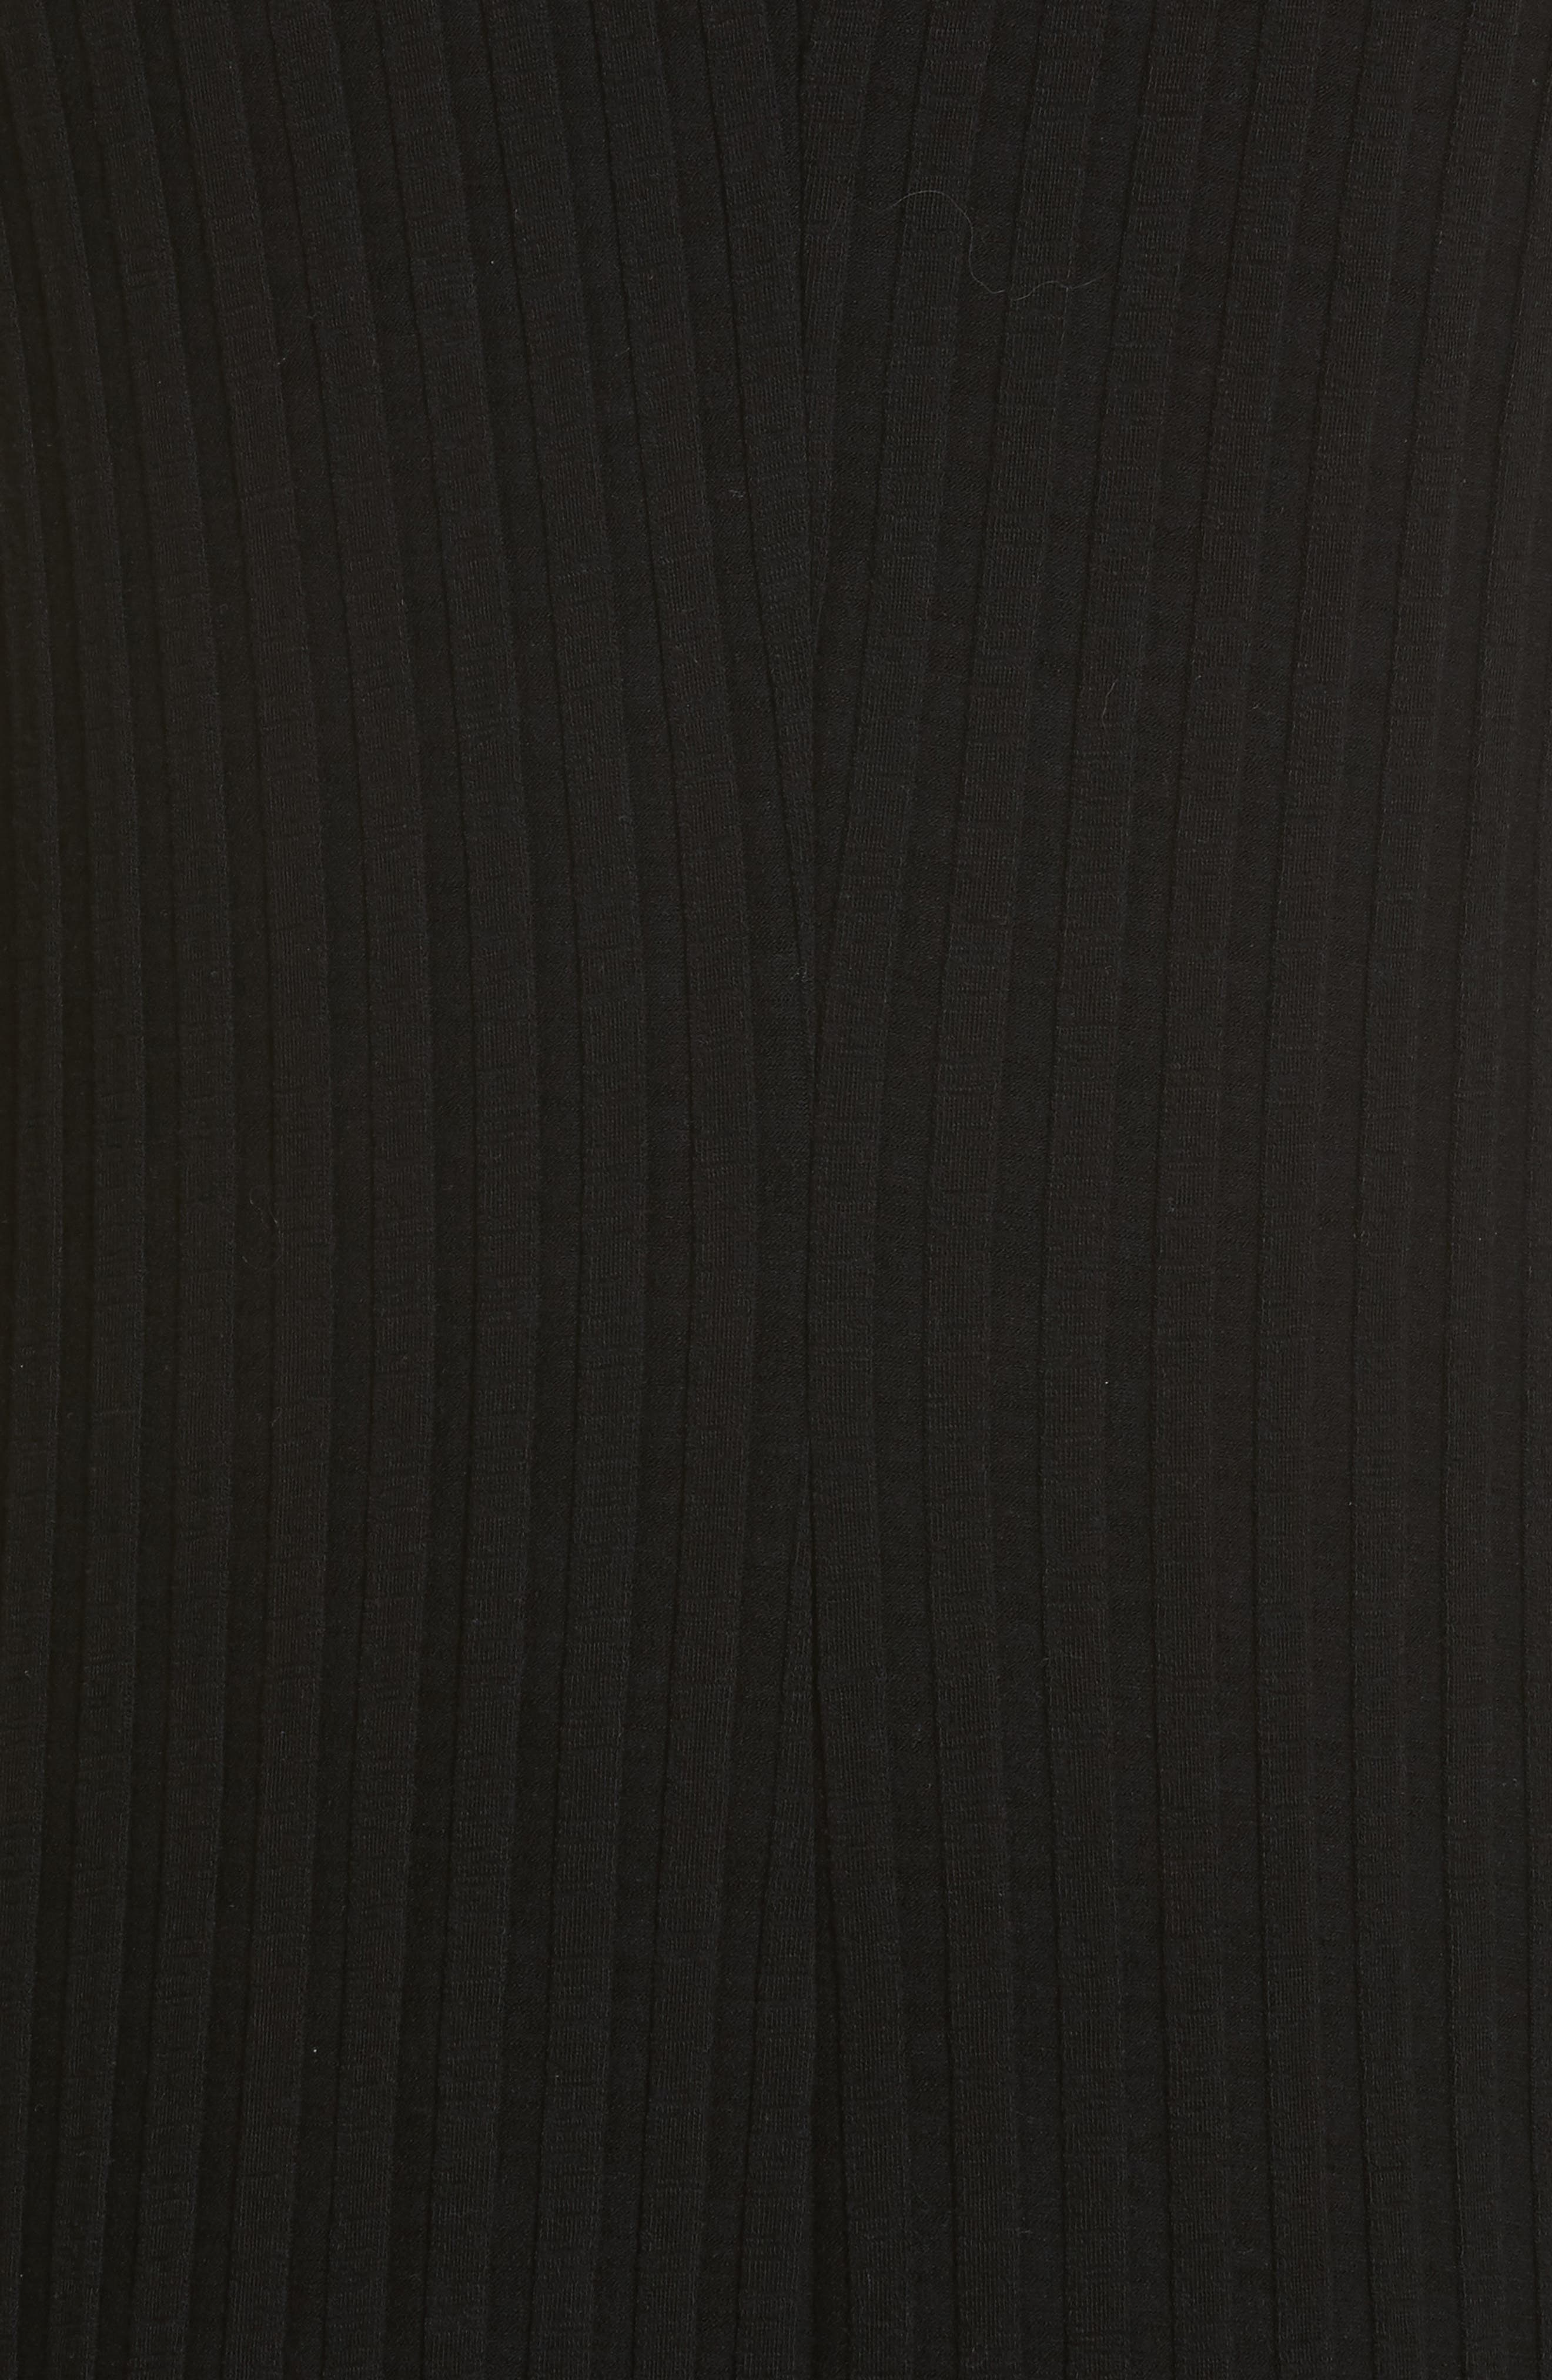 Tali Stretch Ribbed Body-Con Dress,                             Alternate thumbnail 6, color,                             BLACK